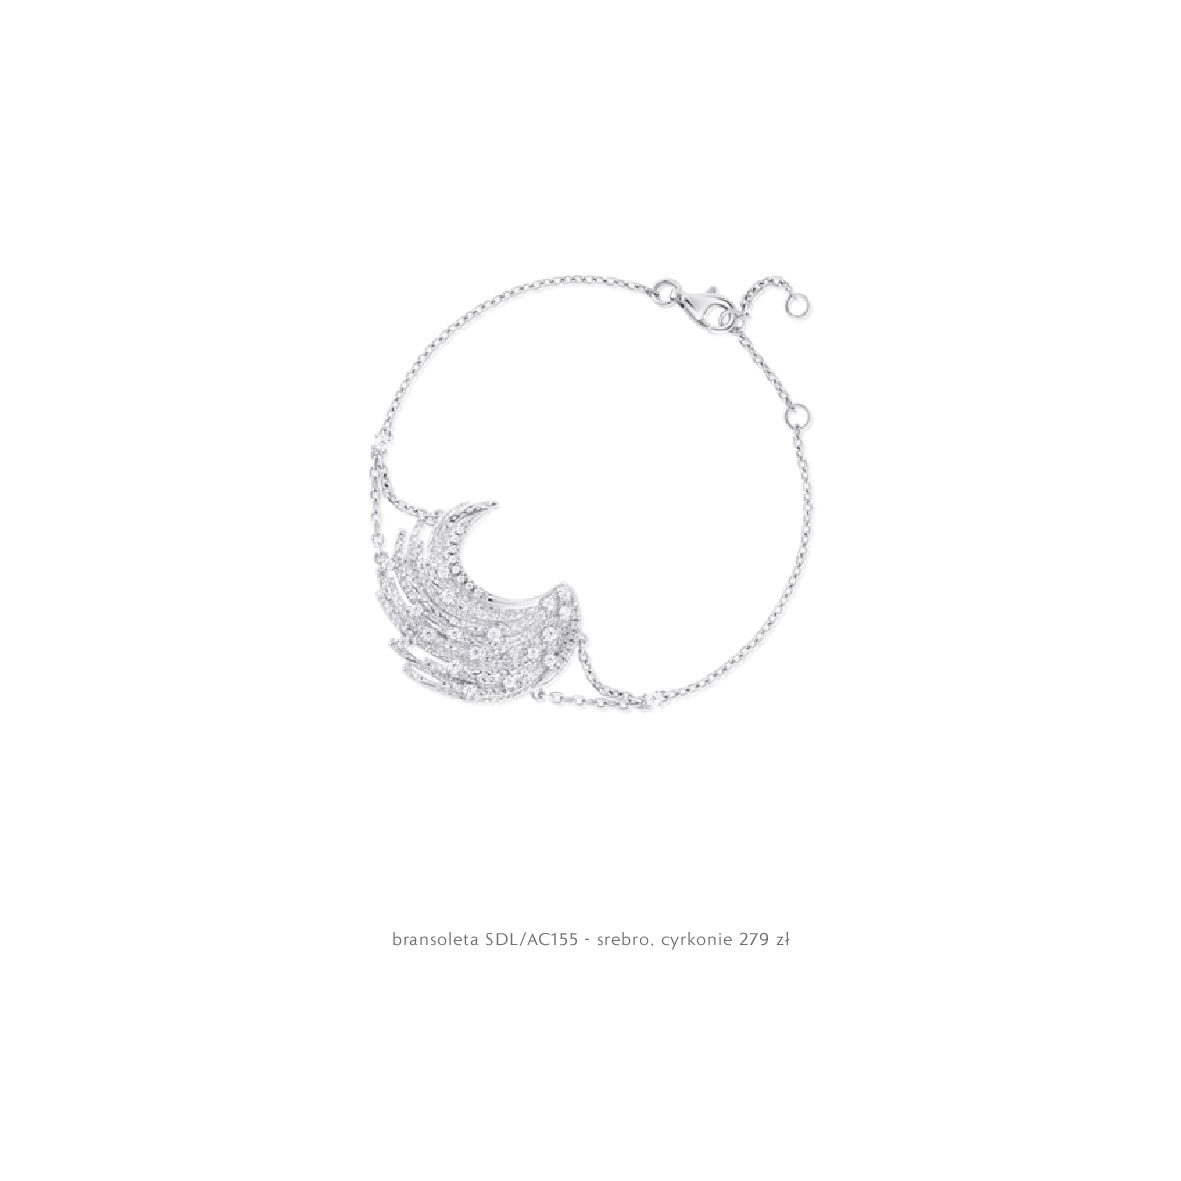 Gazetka W. KRUK: Katalog - Kolekcja Blask 2021-02-17 page-64